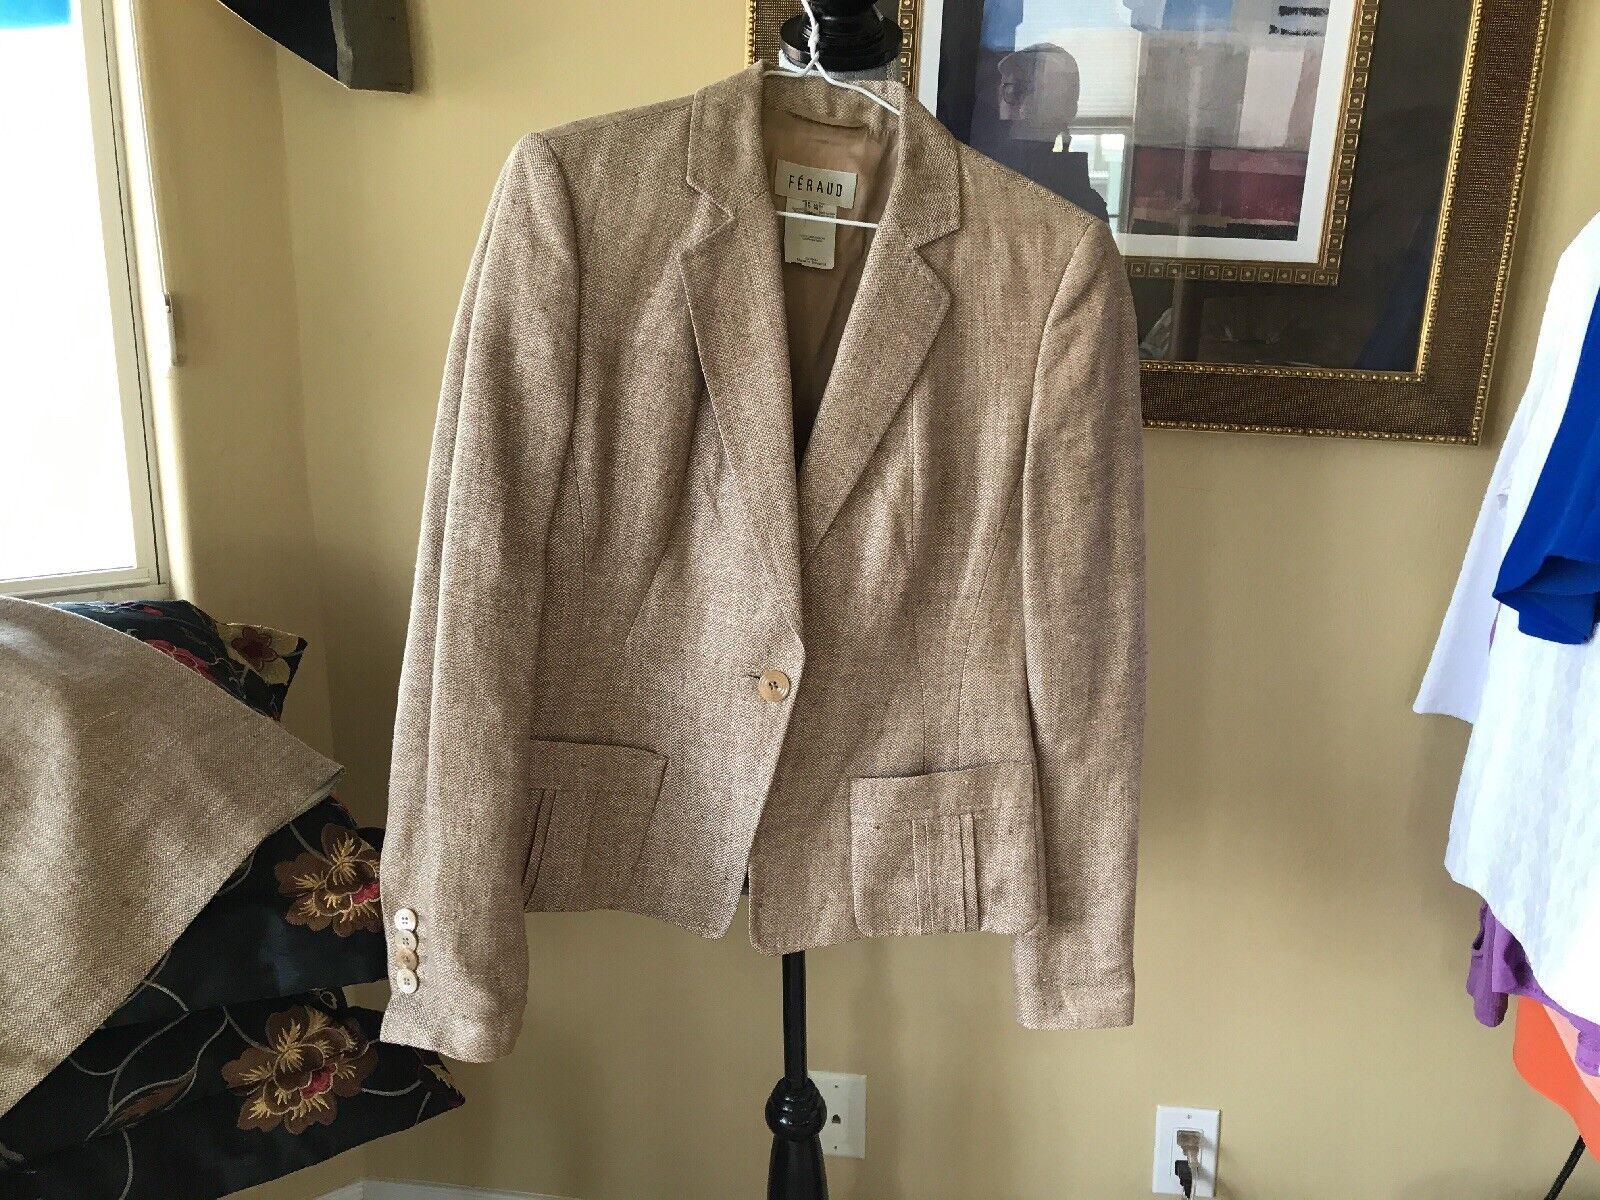 Feraud 2 Piece Suit. Size 8